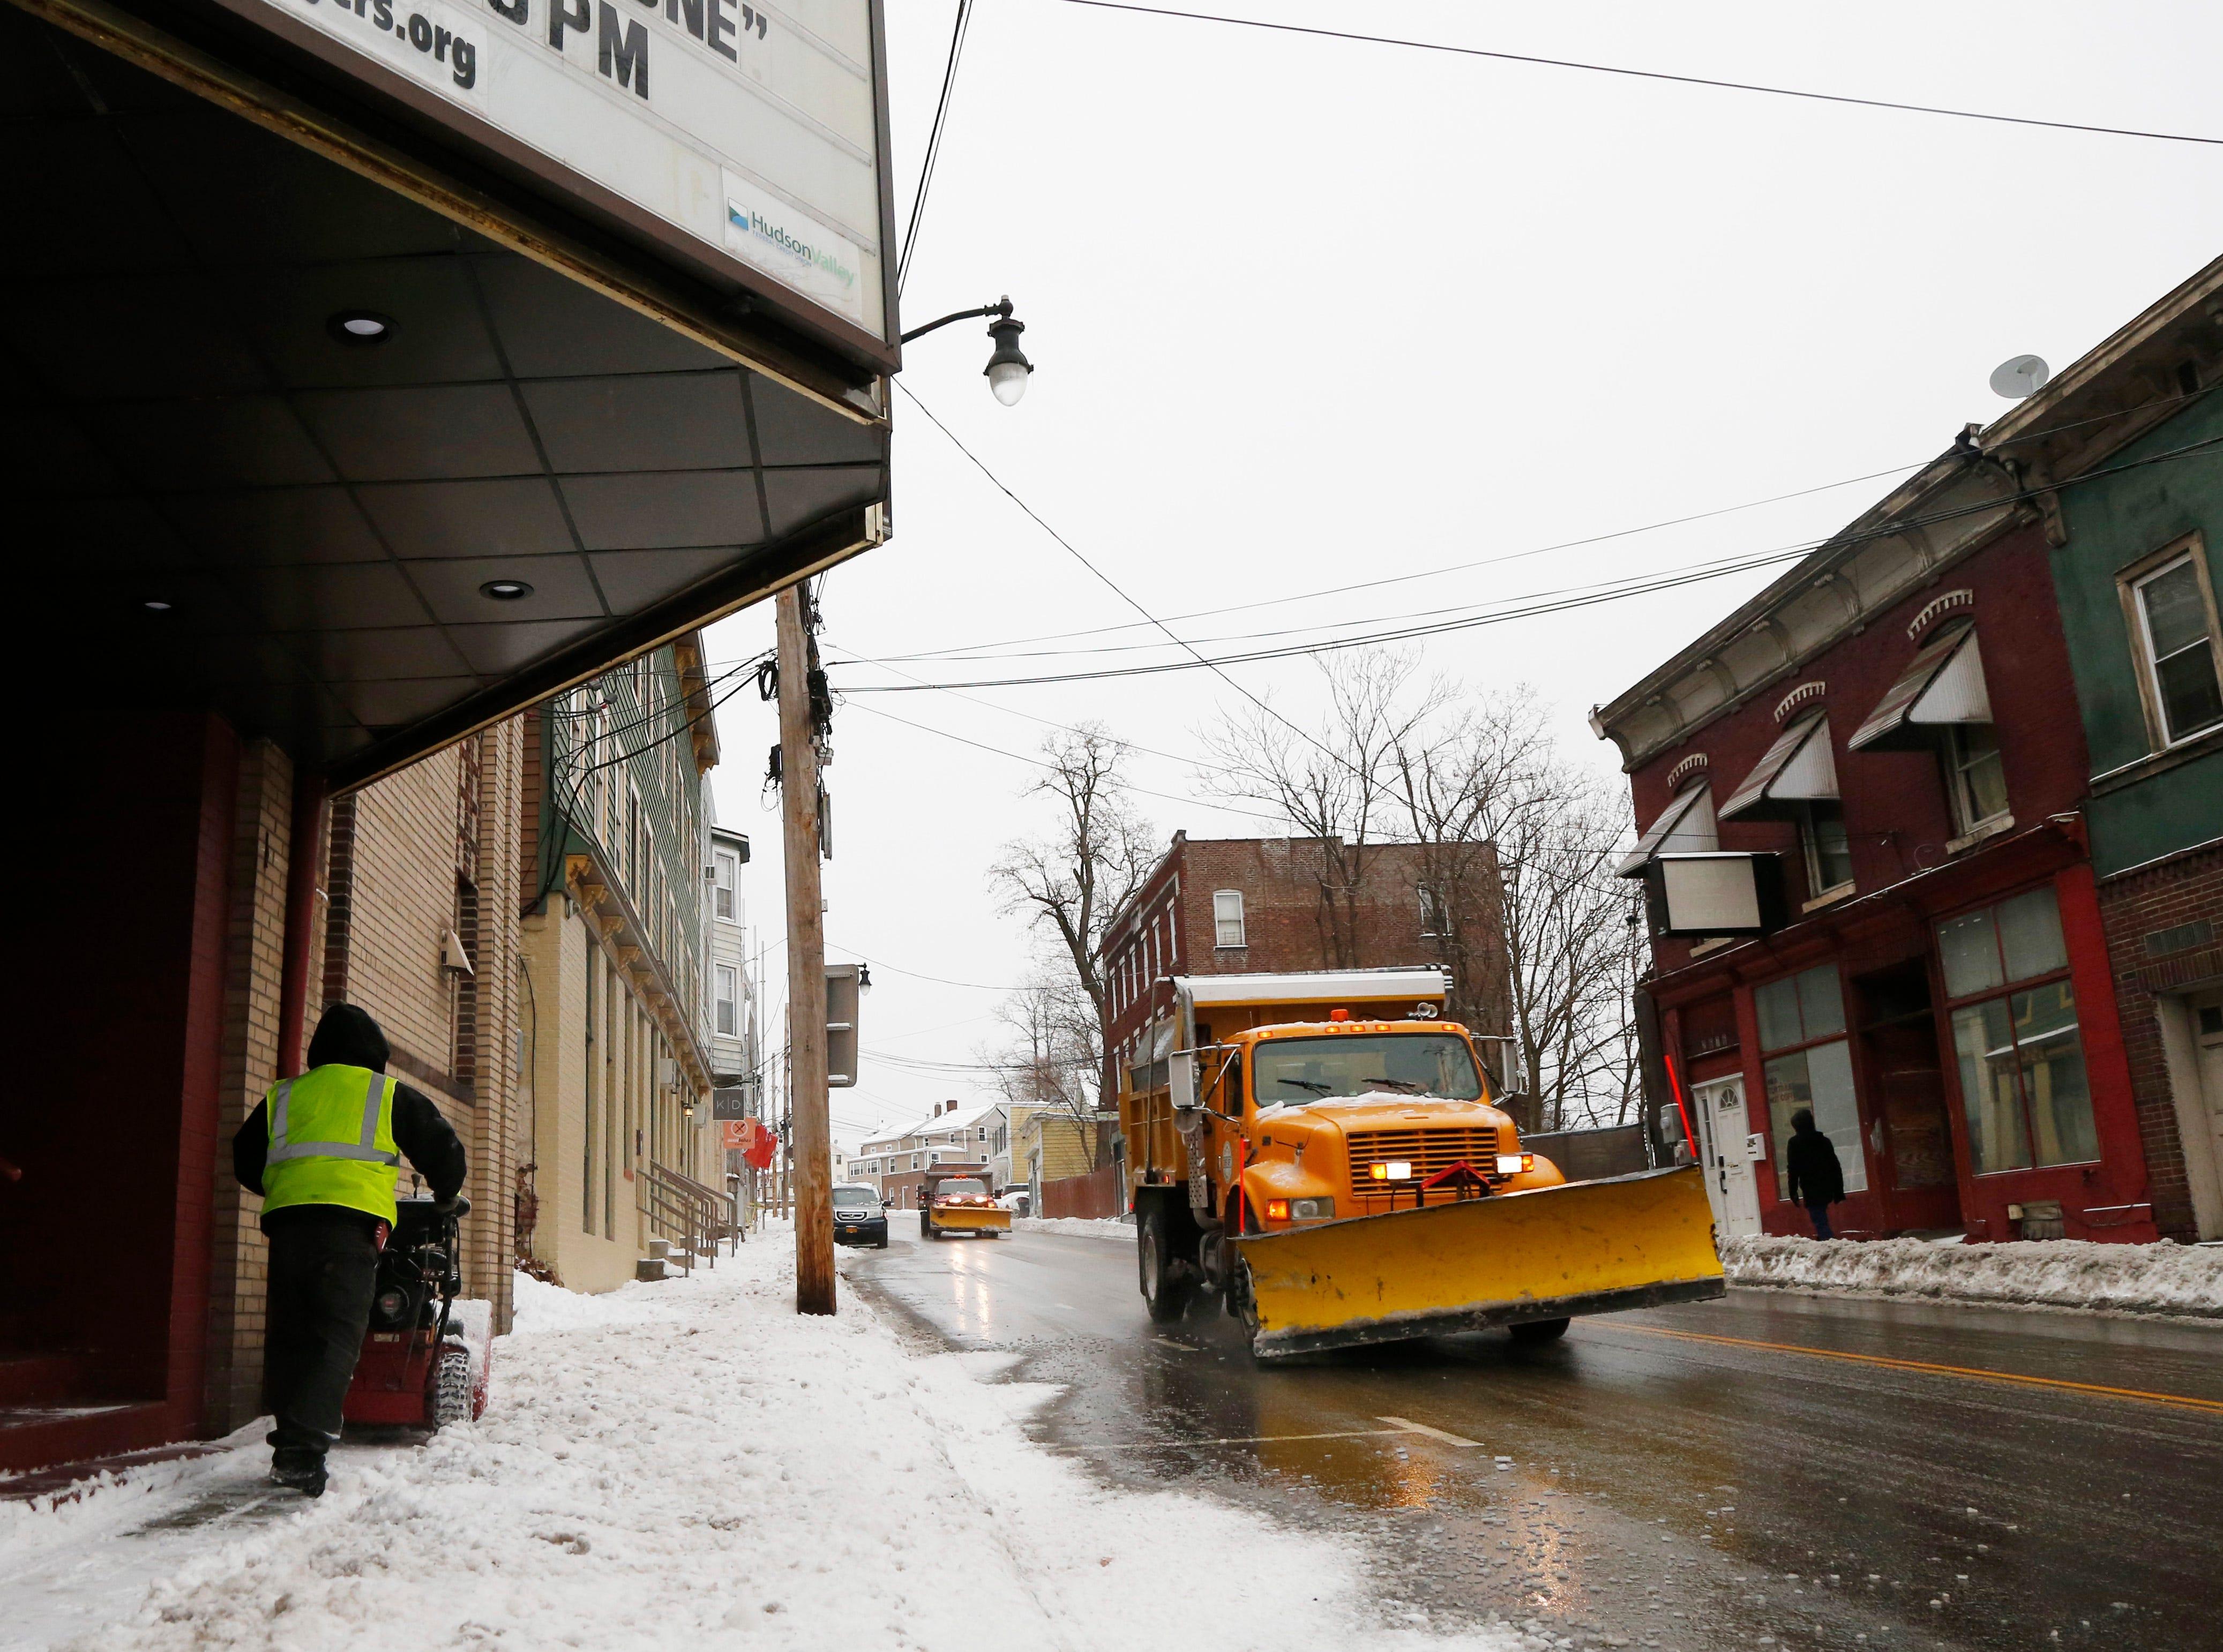 Mauricio Sibada clears the sidewalk along West Main Street as a Village of Wappingers Falls plow travels south in the Village of Wappingers Falls on January 20, 2019.